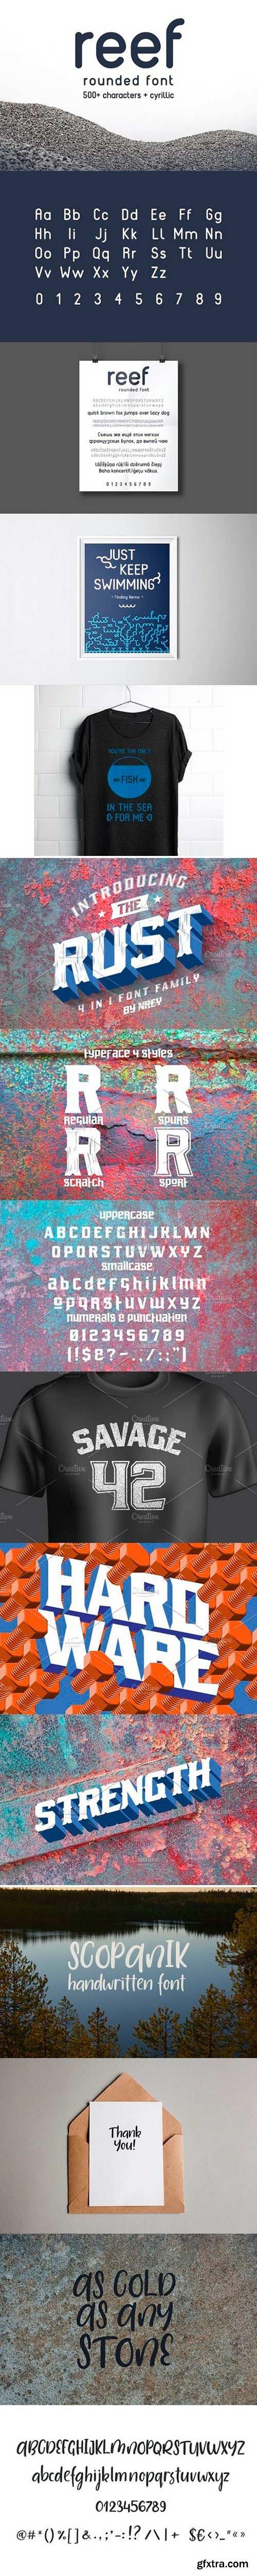 Rust, Scopanik, REEF Fonts